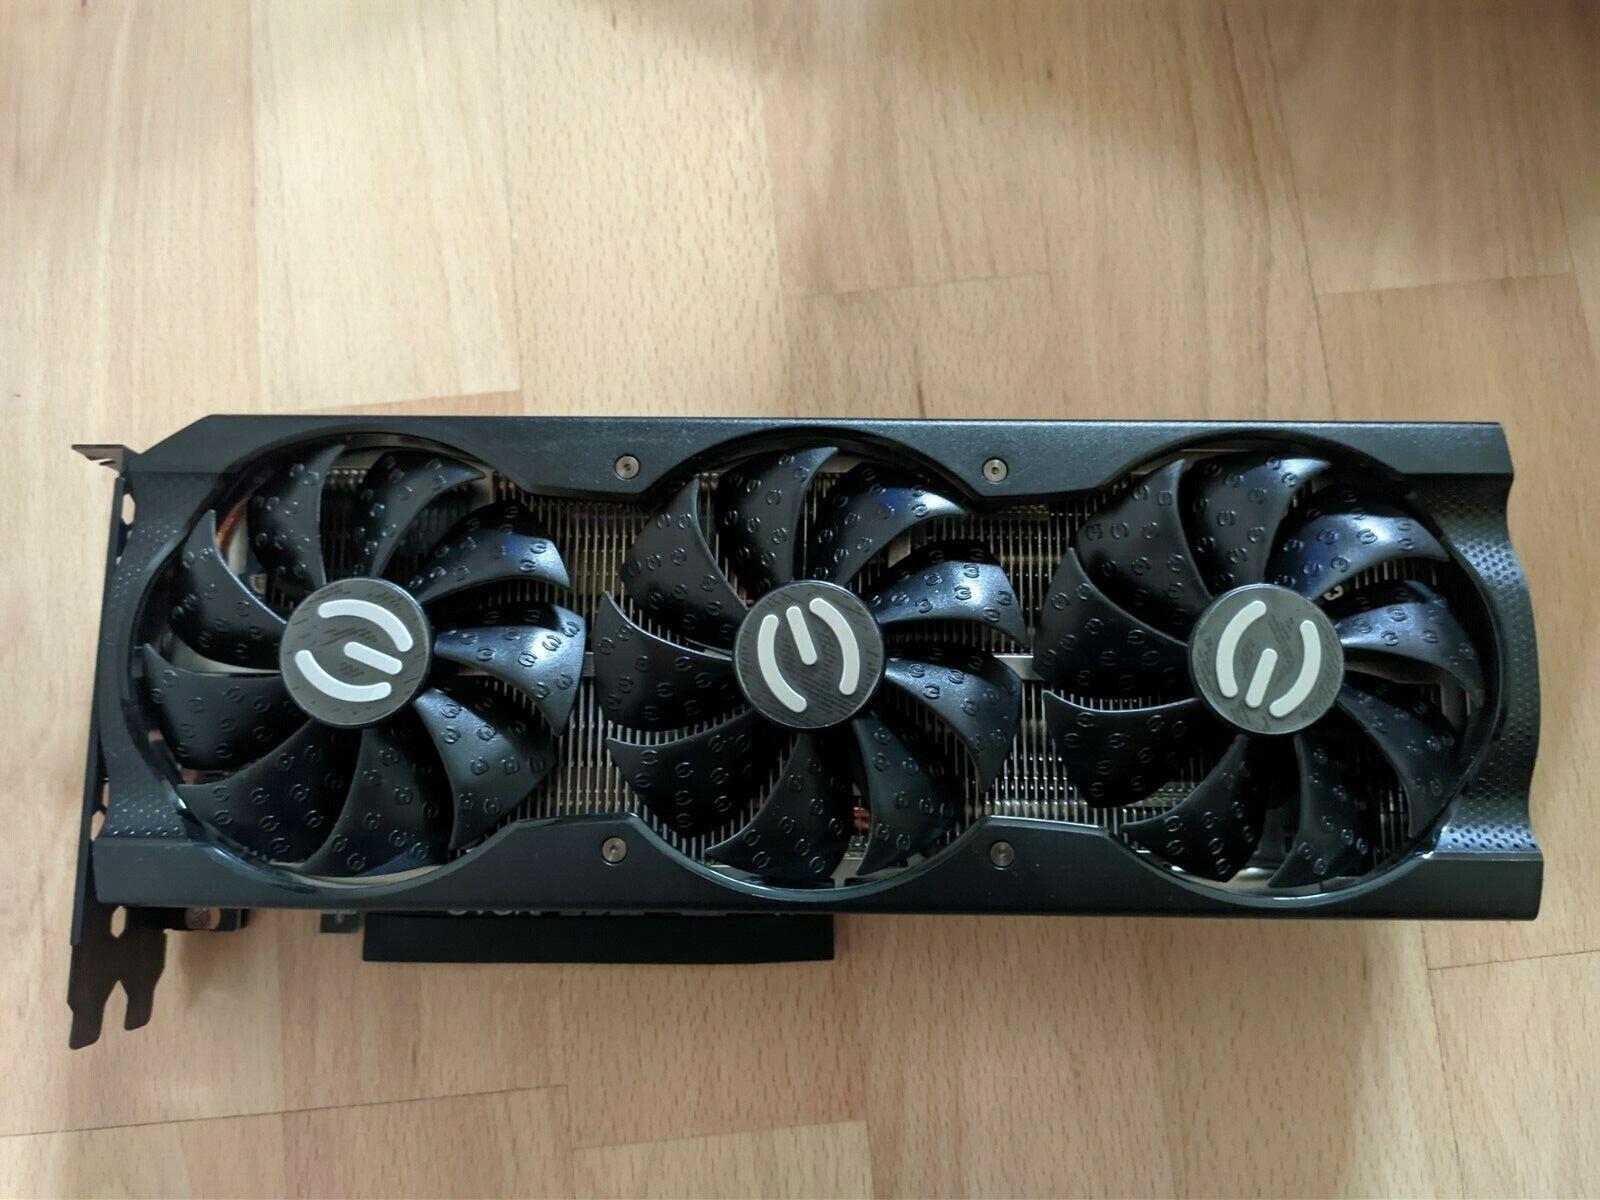 EVGA GeForce RTX 3070 XC3 ULTRA 8GB GDDR6 Grafikkarte rBAR aktiv non-lhr